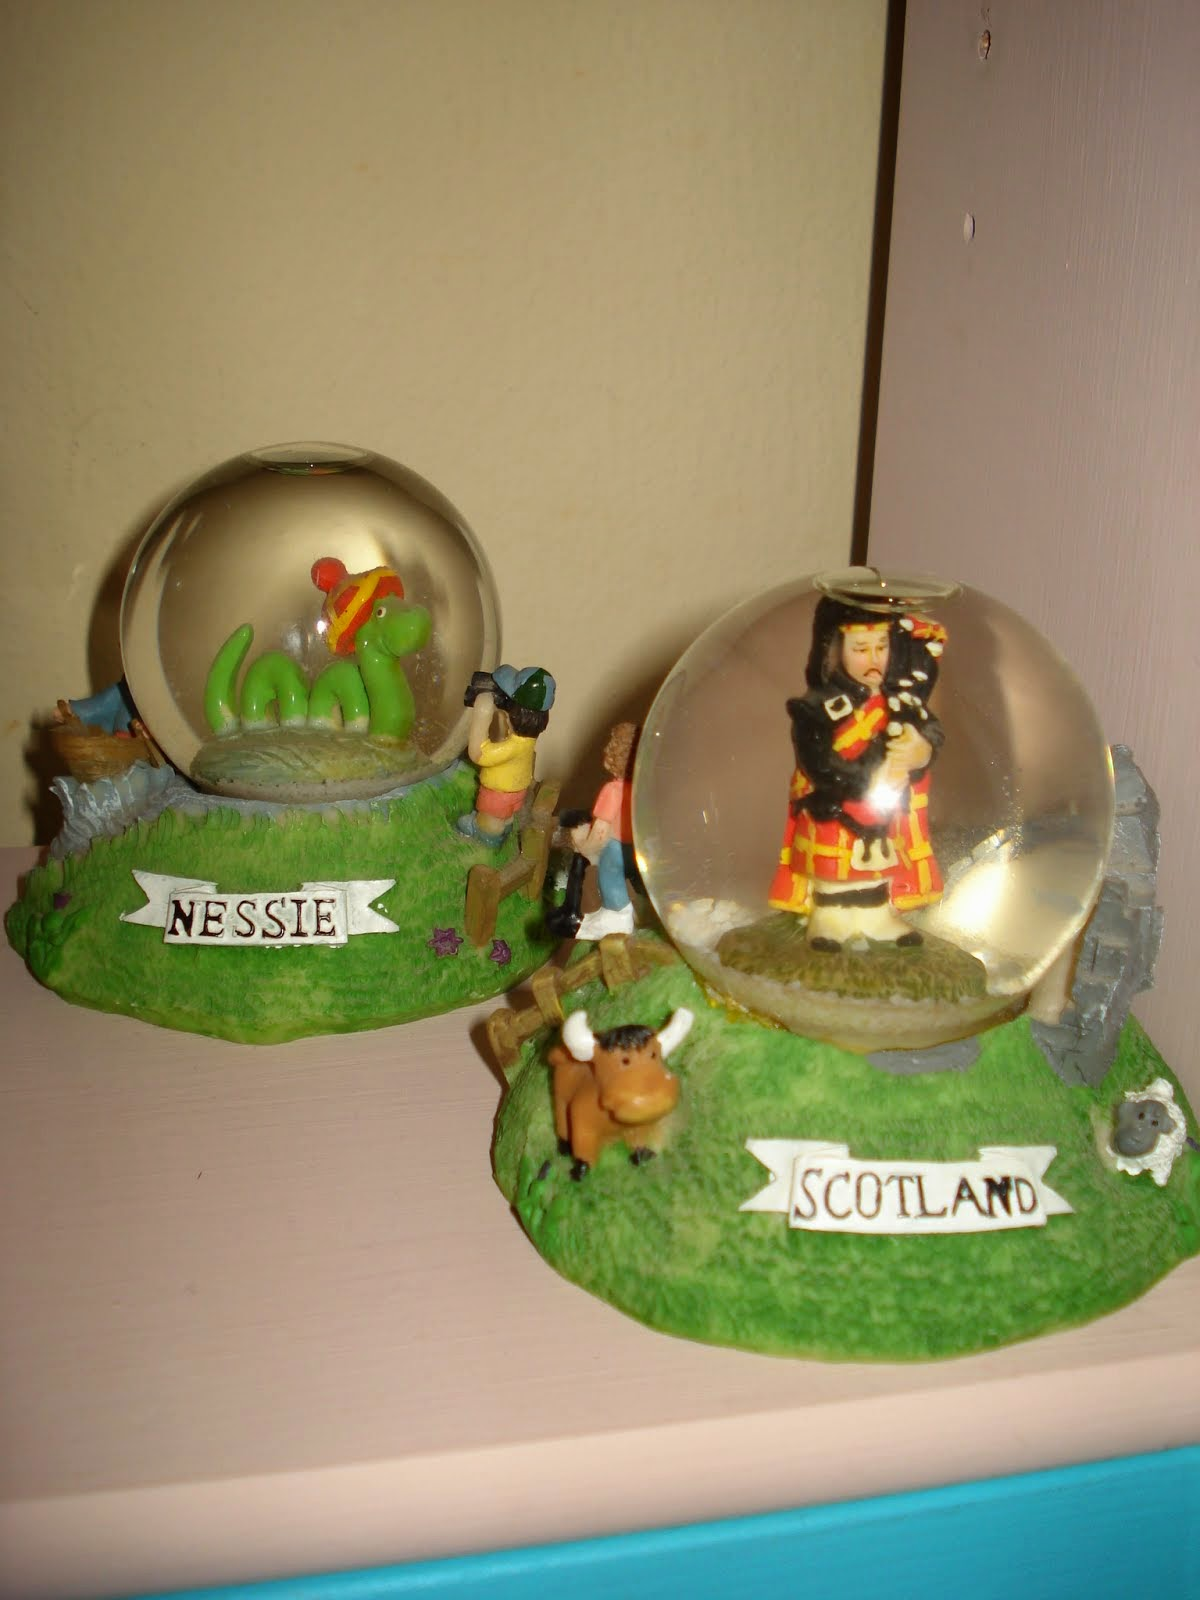 Scotland-Nessie